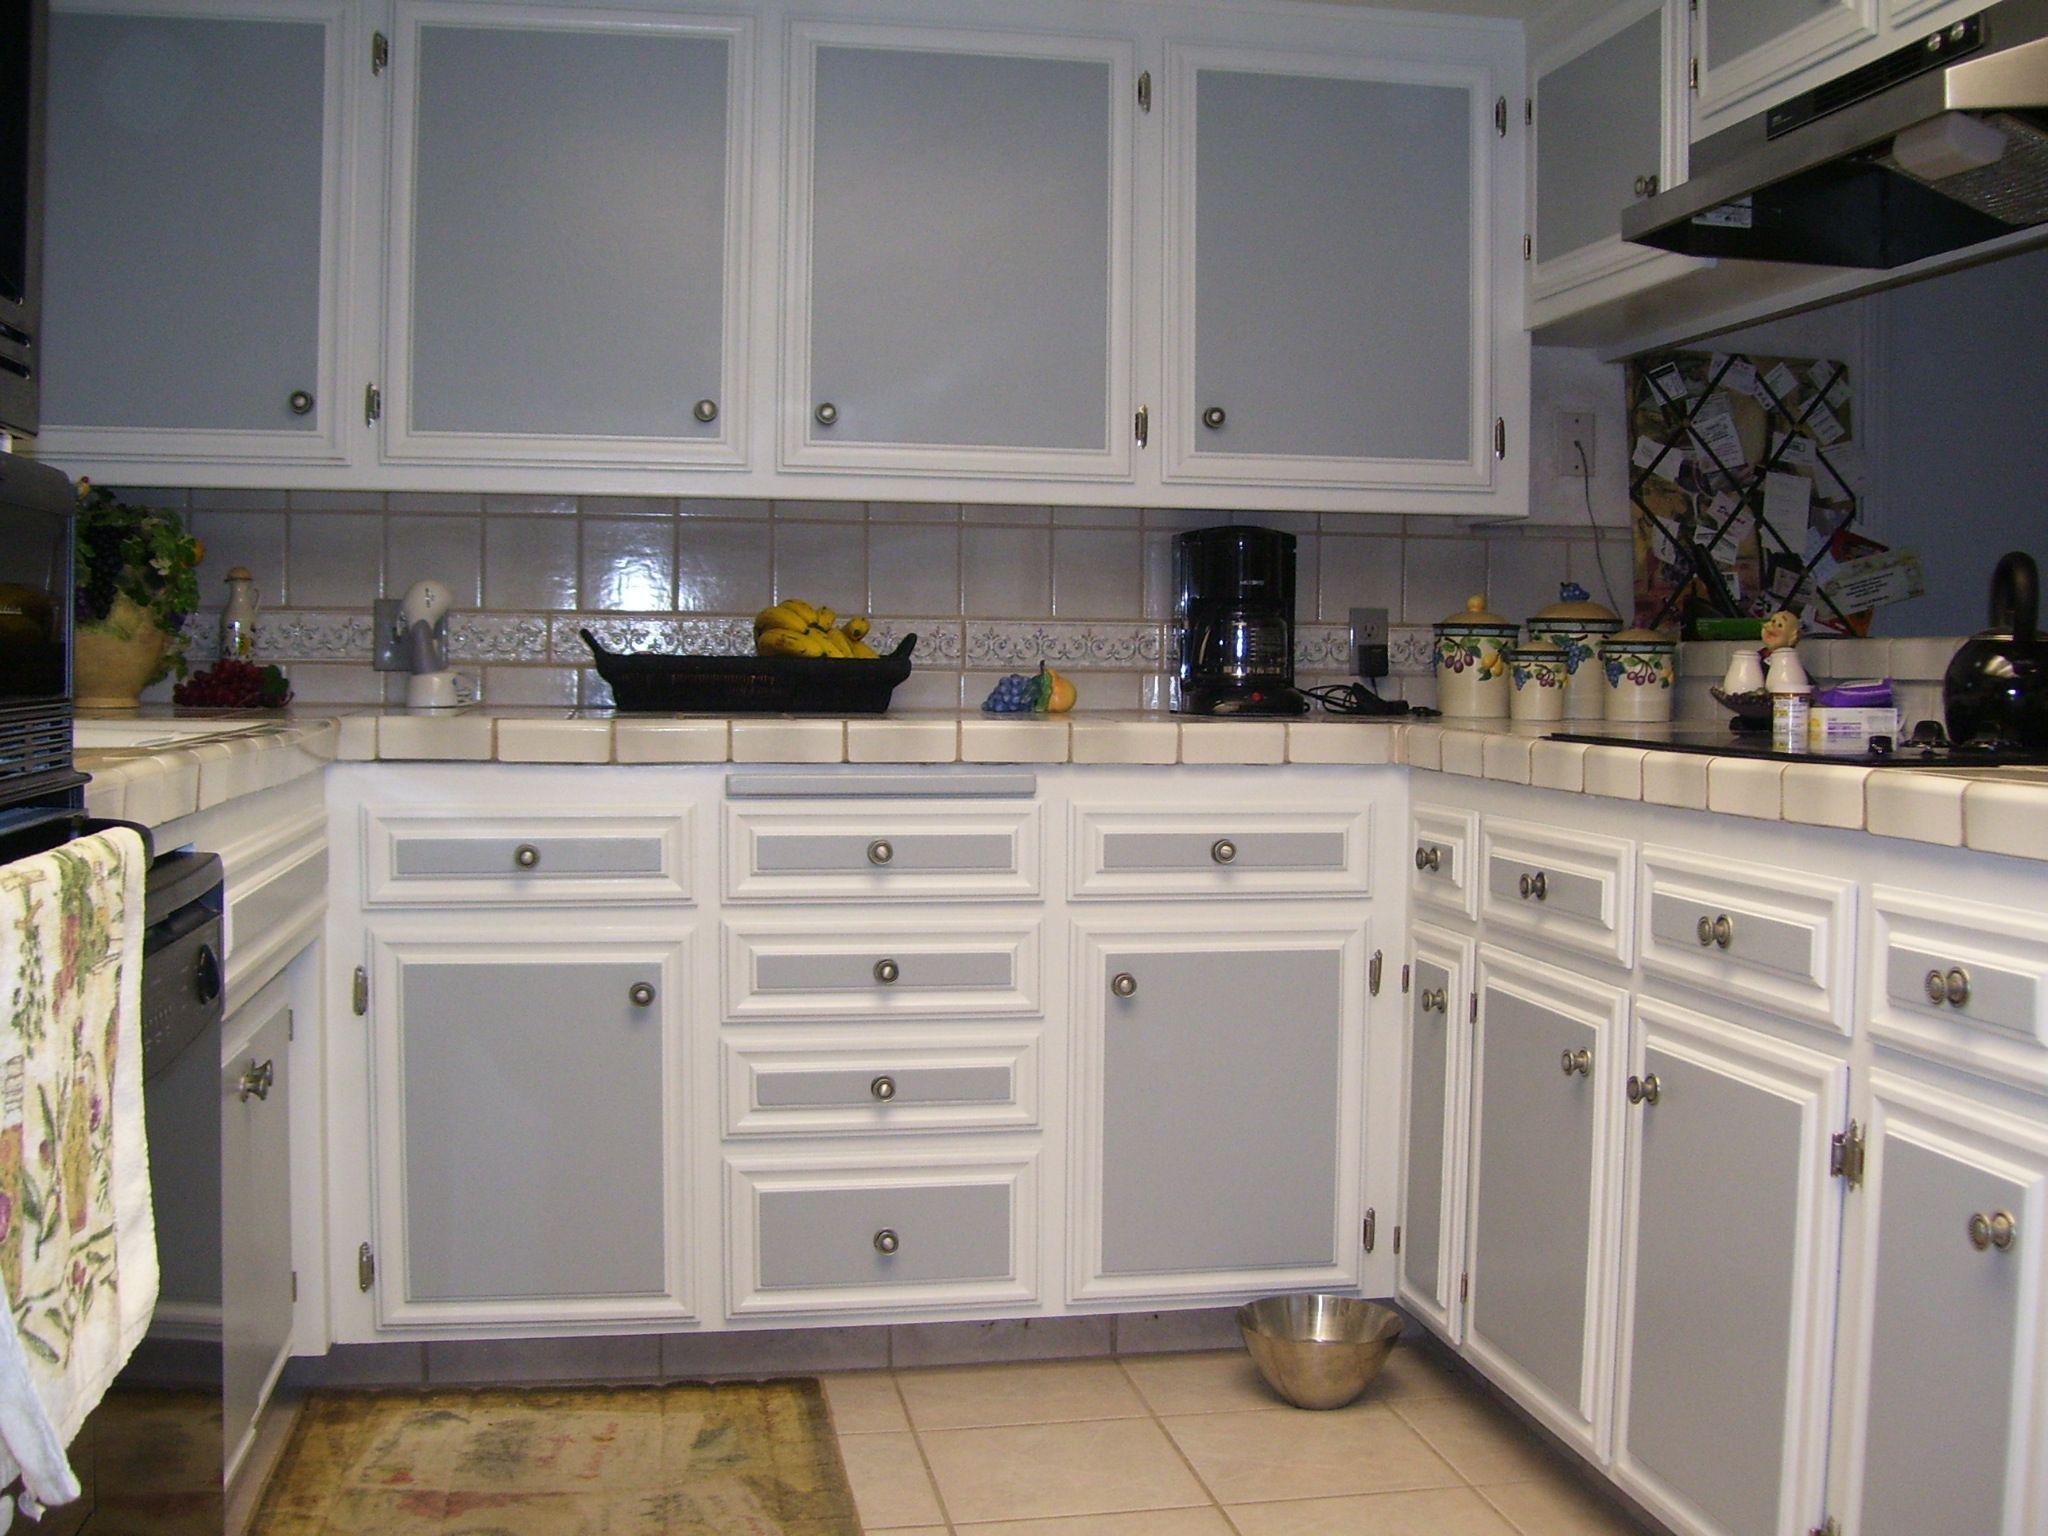 Kitchen White Kitchen Cabinet Grey Door Brown Tile Floor